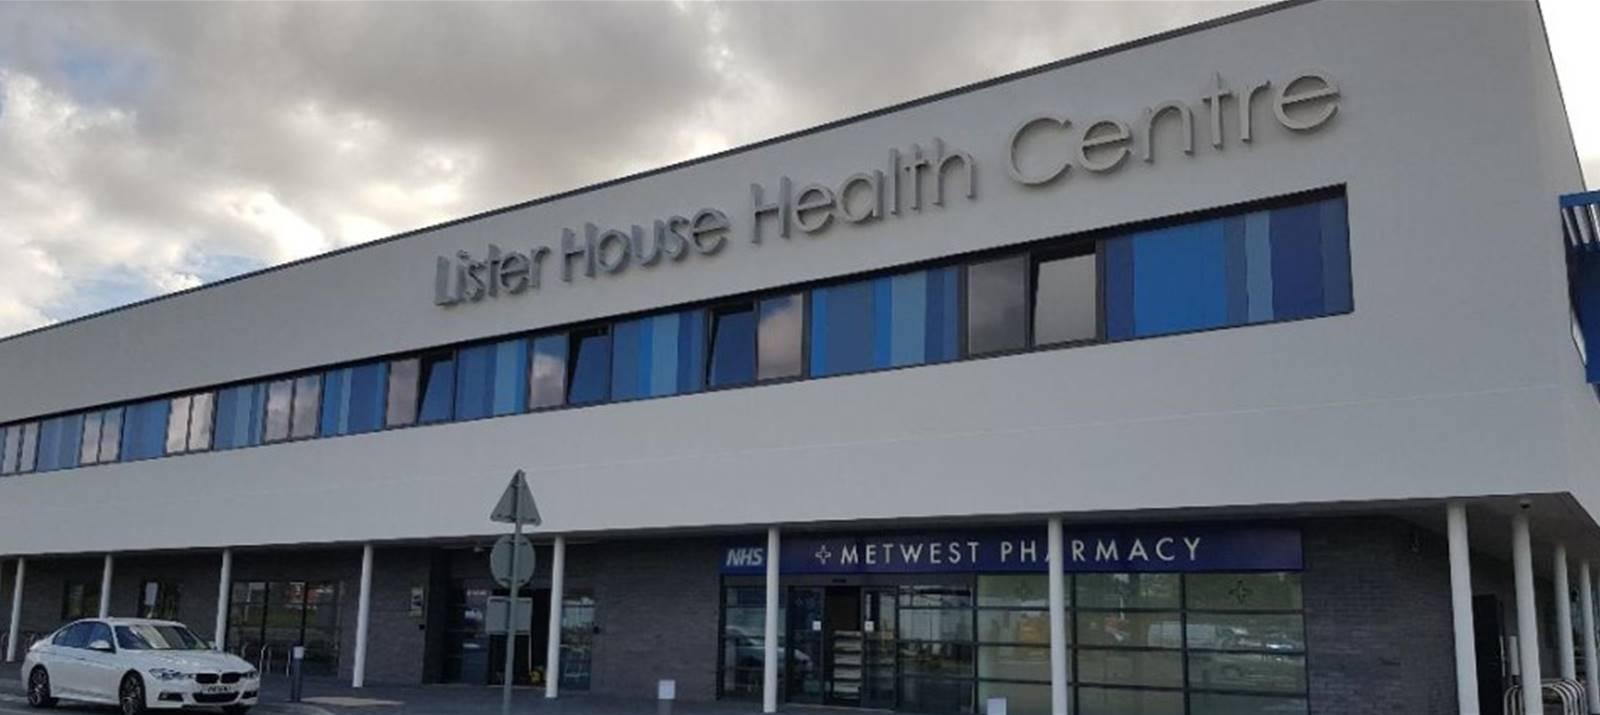 Lister House Health Centre main sign